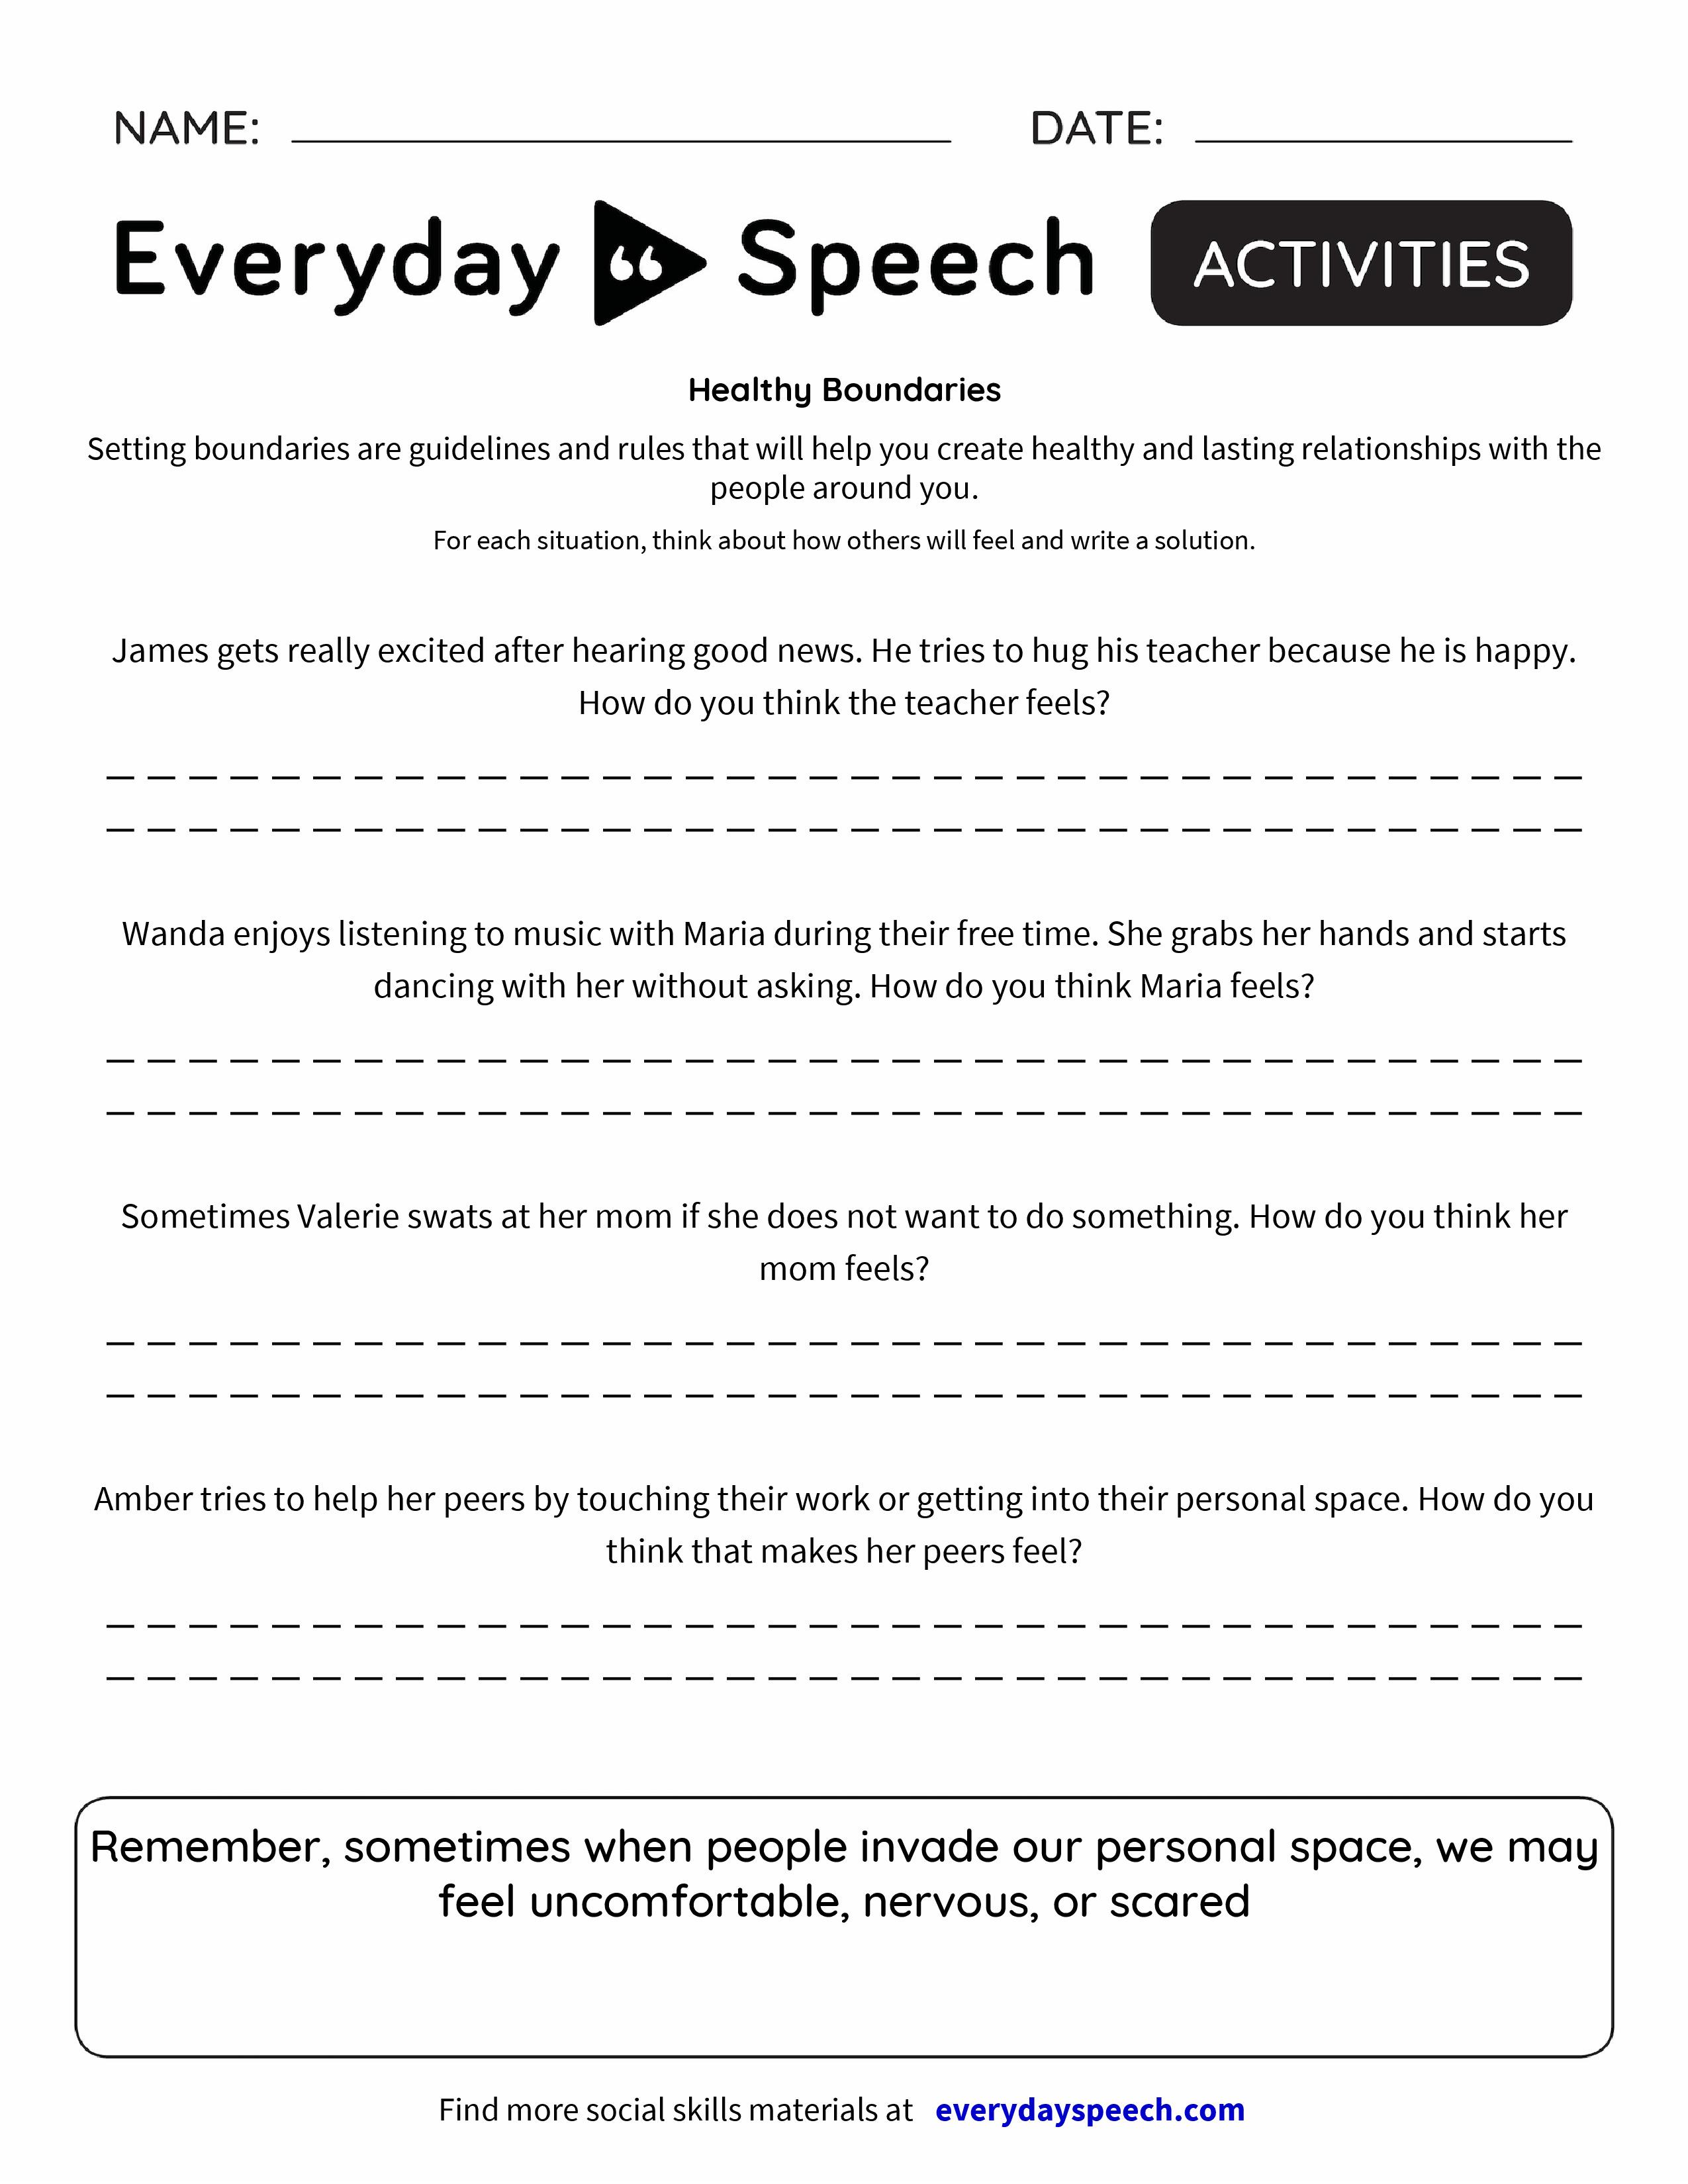 Healthy Boundaries - Everyday Speech - Everyday Speech